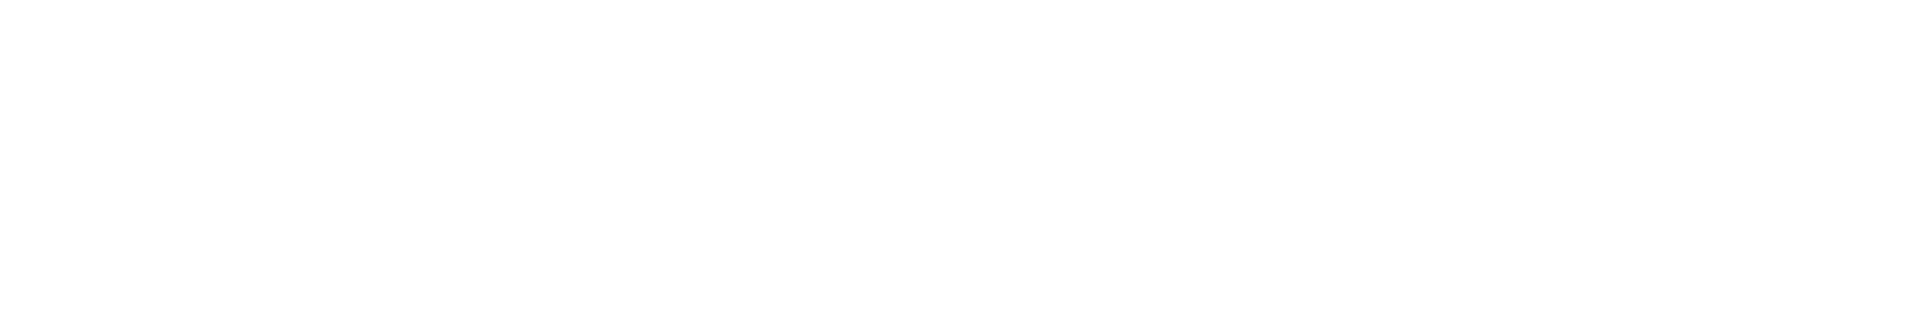 Annette Caldwell Simmons School of Education & Human Development